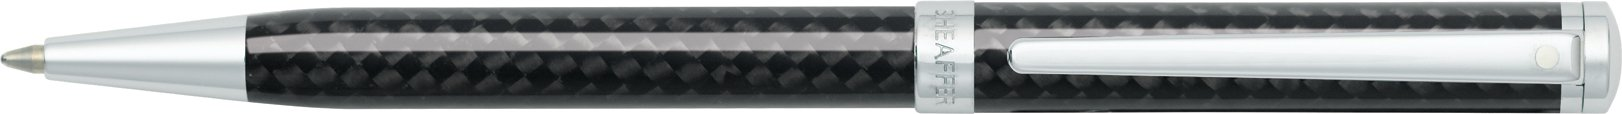 Sheaffer Intensity Carbon Fiber Ballpoint Pen with Chrome-Plated Trim